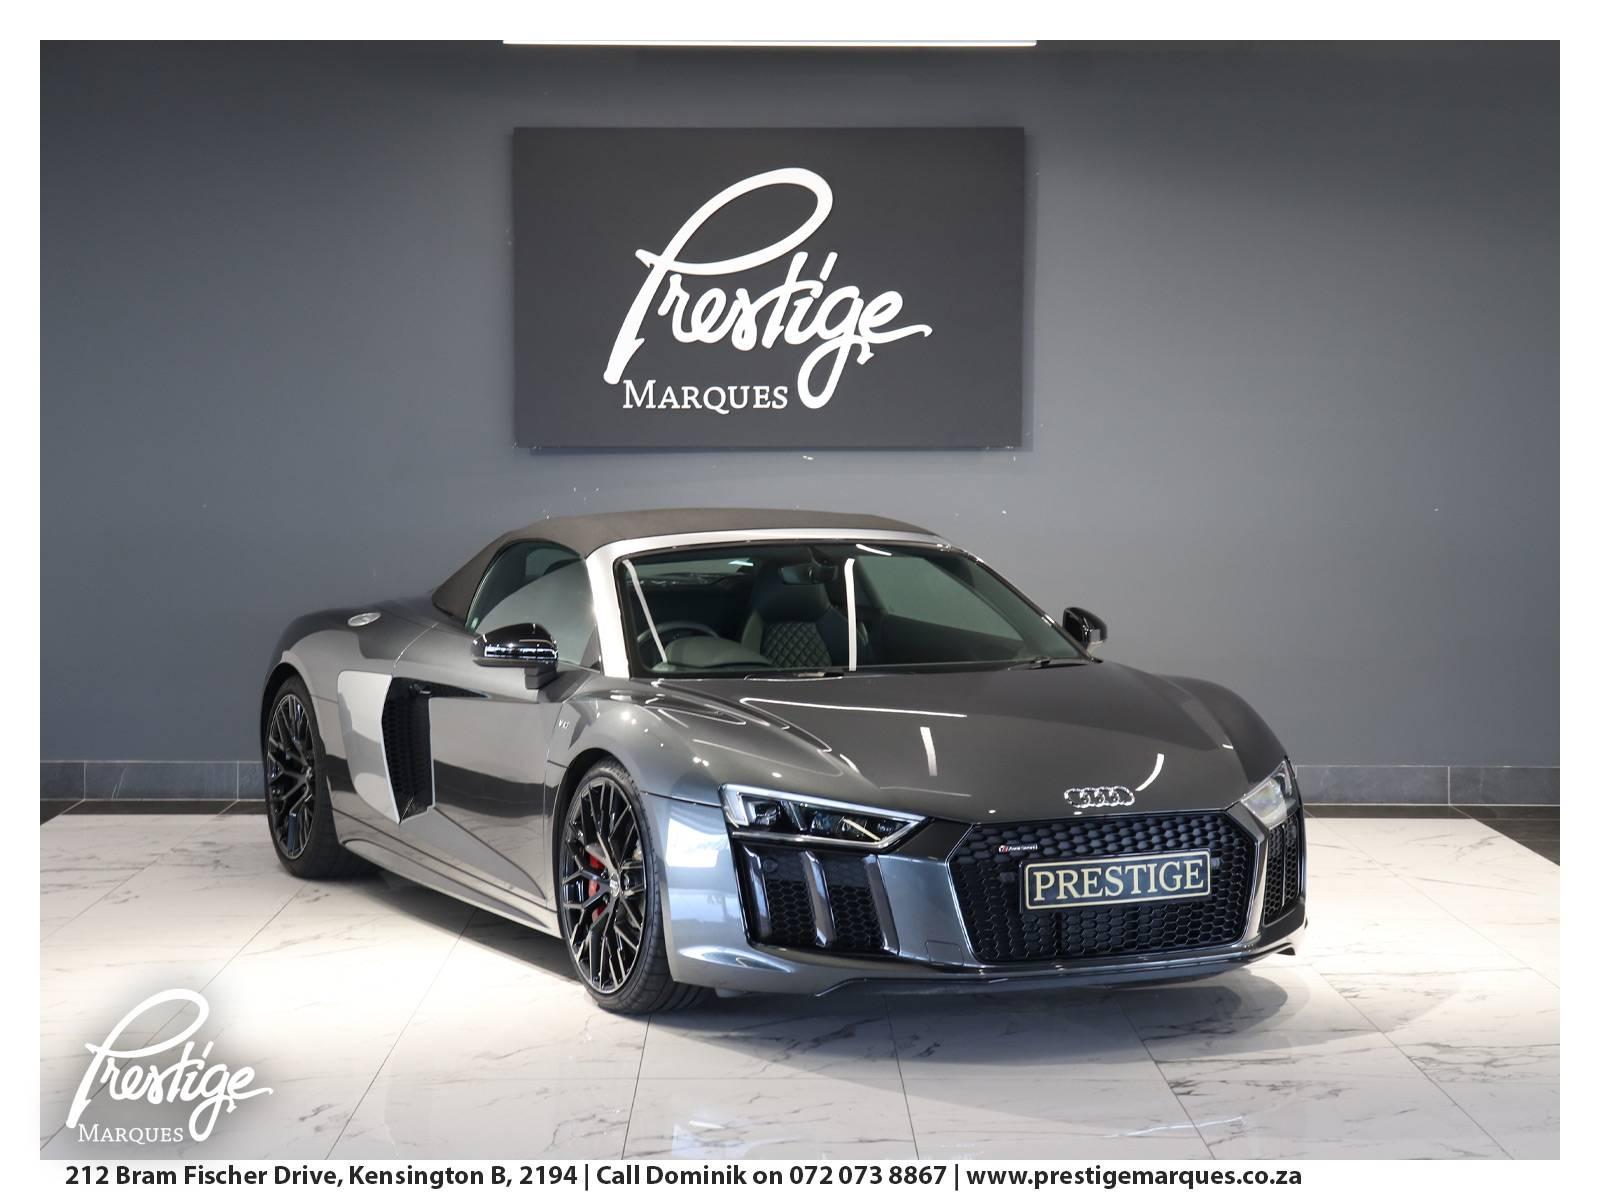 2019-Audi-R8-Prestige-Marques-Randburg-Sandton-2